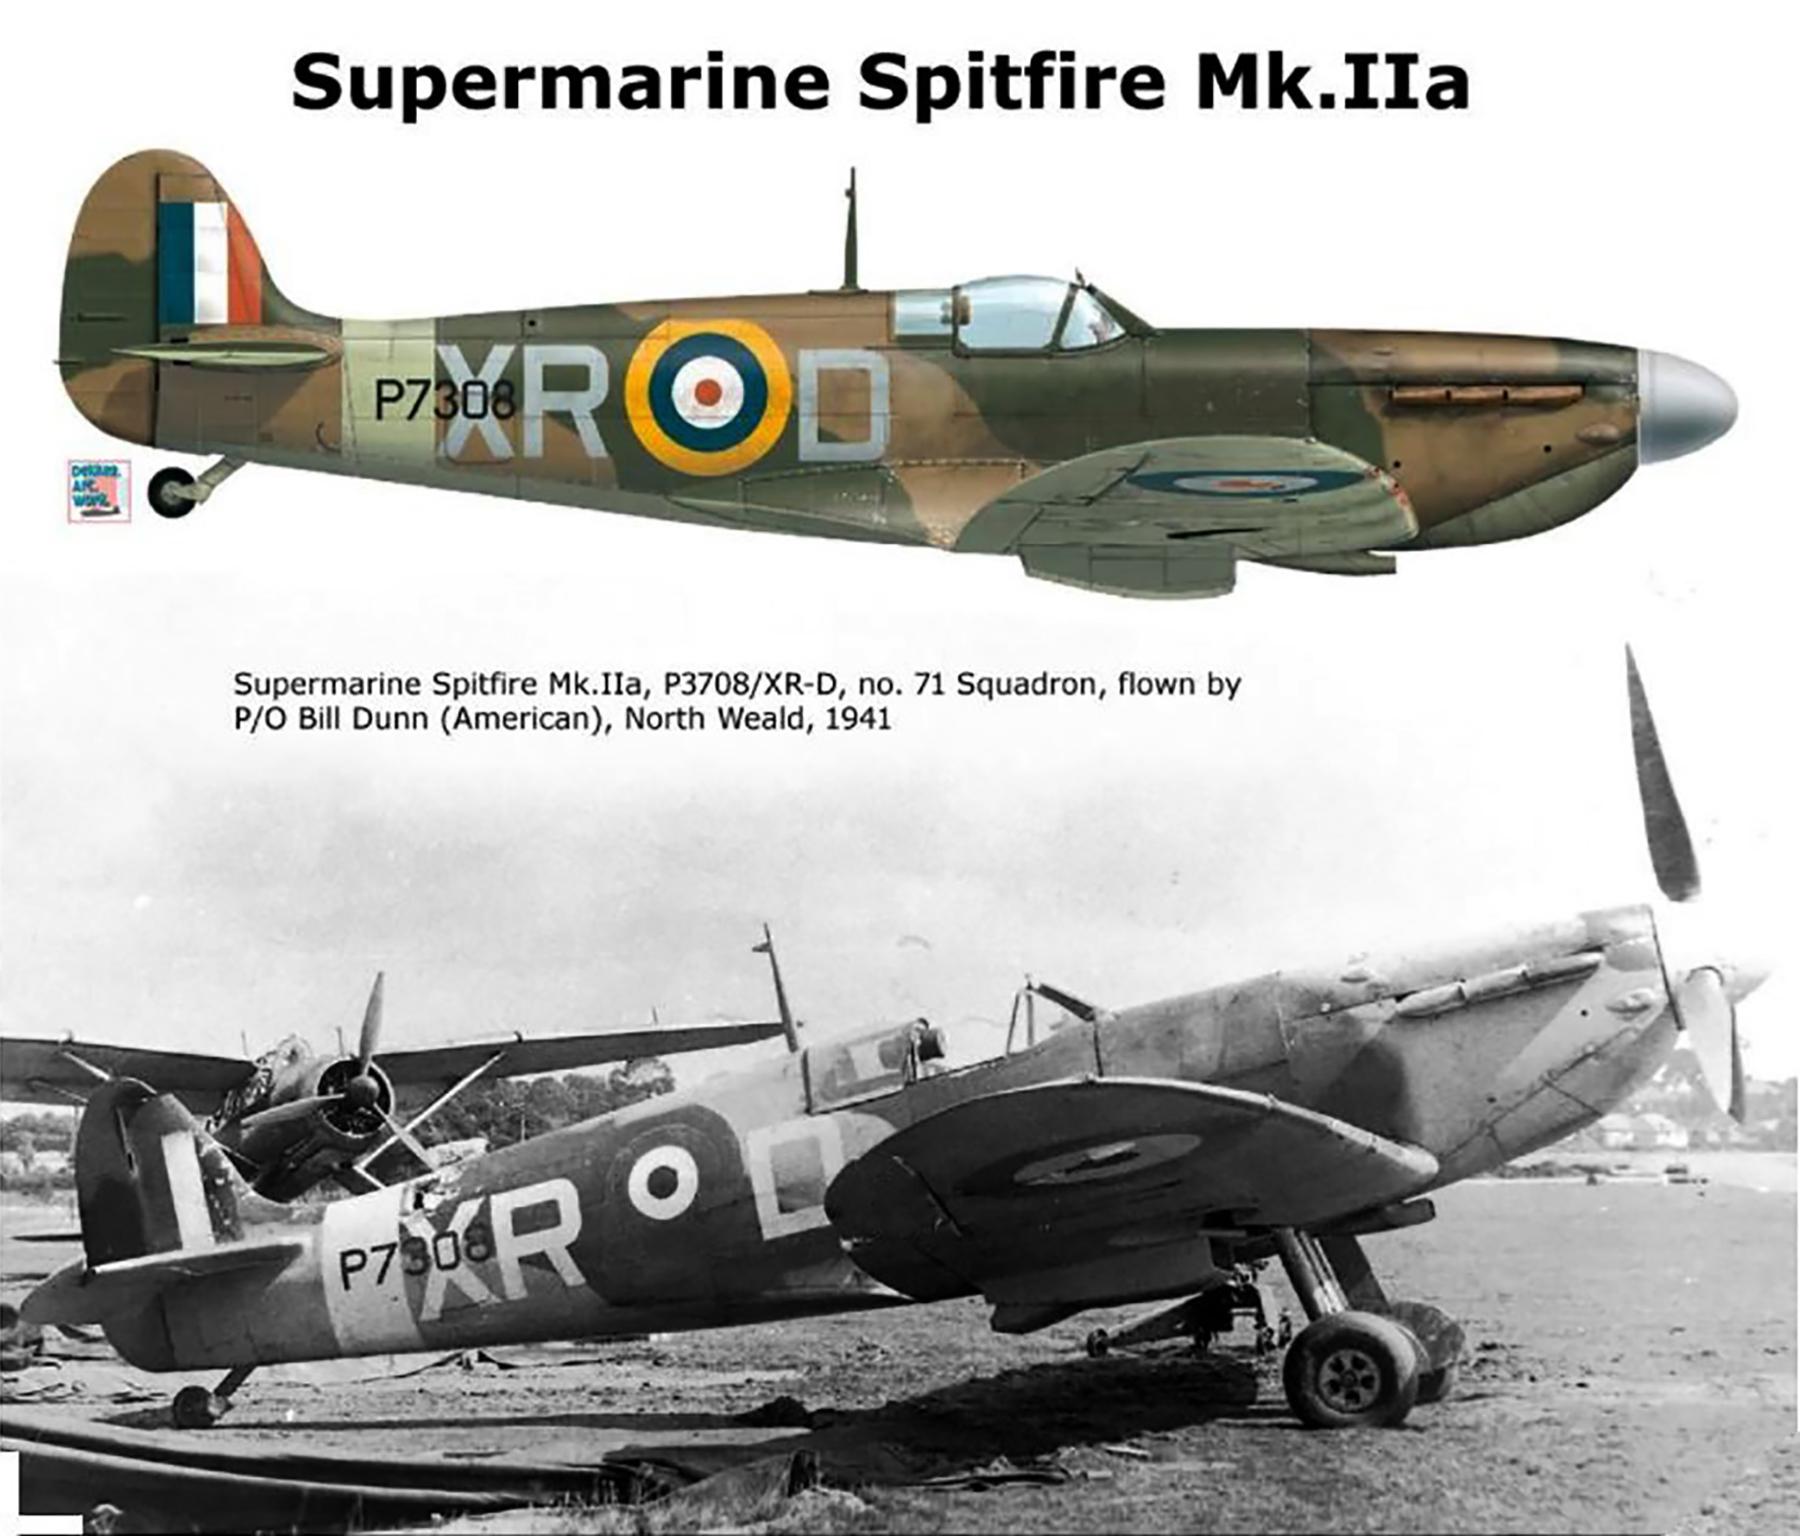 Spitfire MkIIa RAF 71Sqn XRD Bill Dunn P3708 North Weald 1941 0A